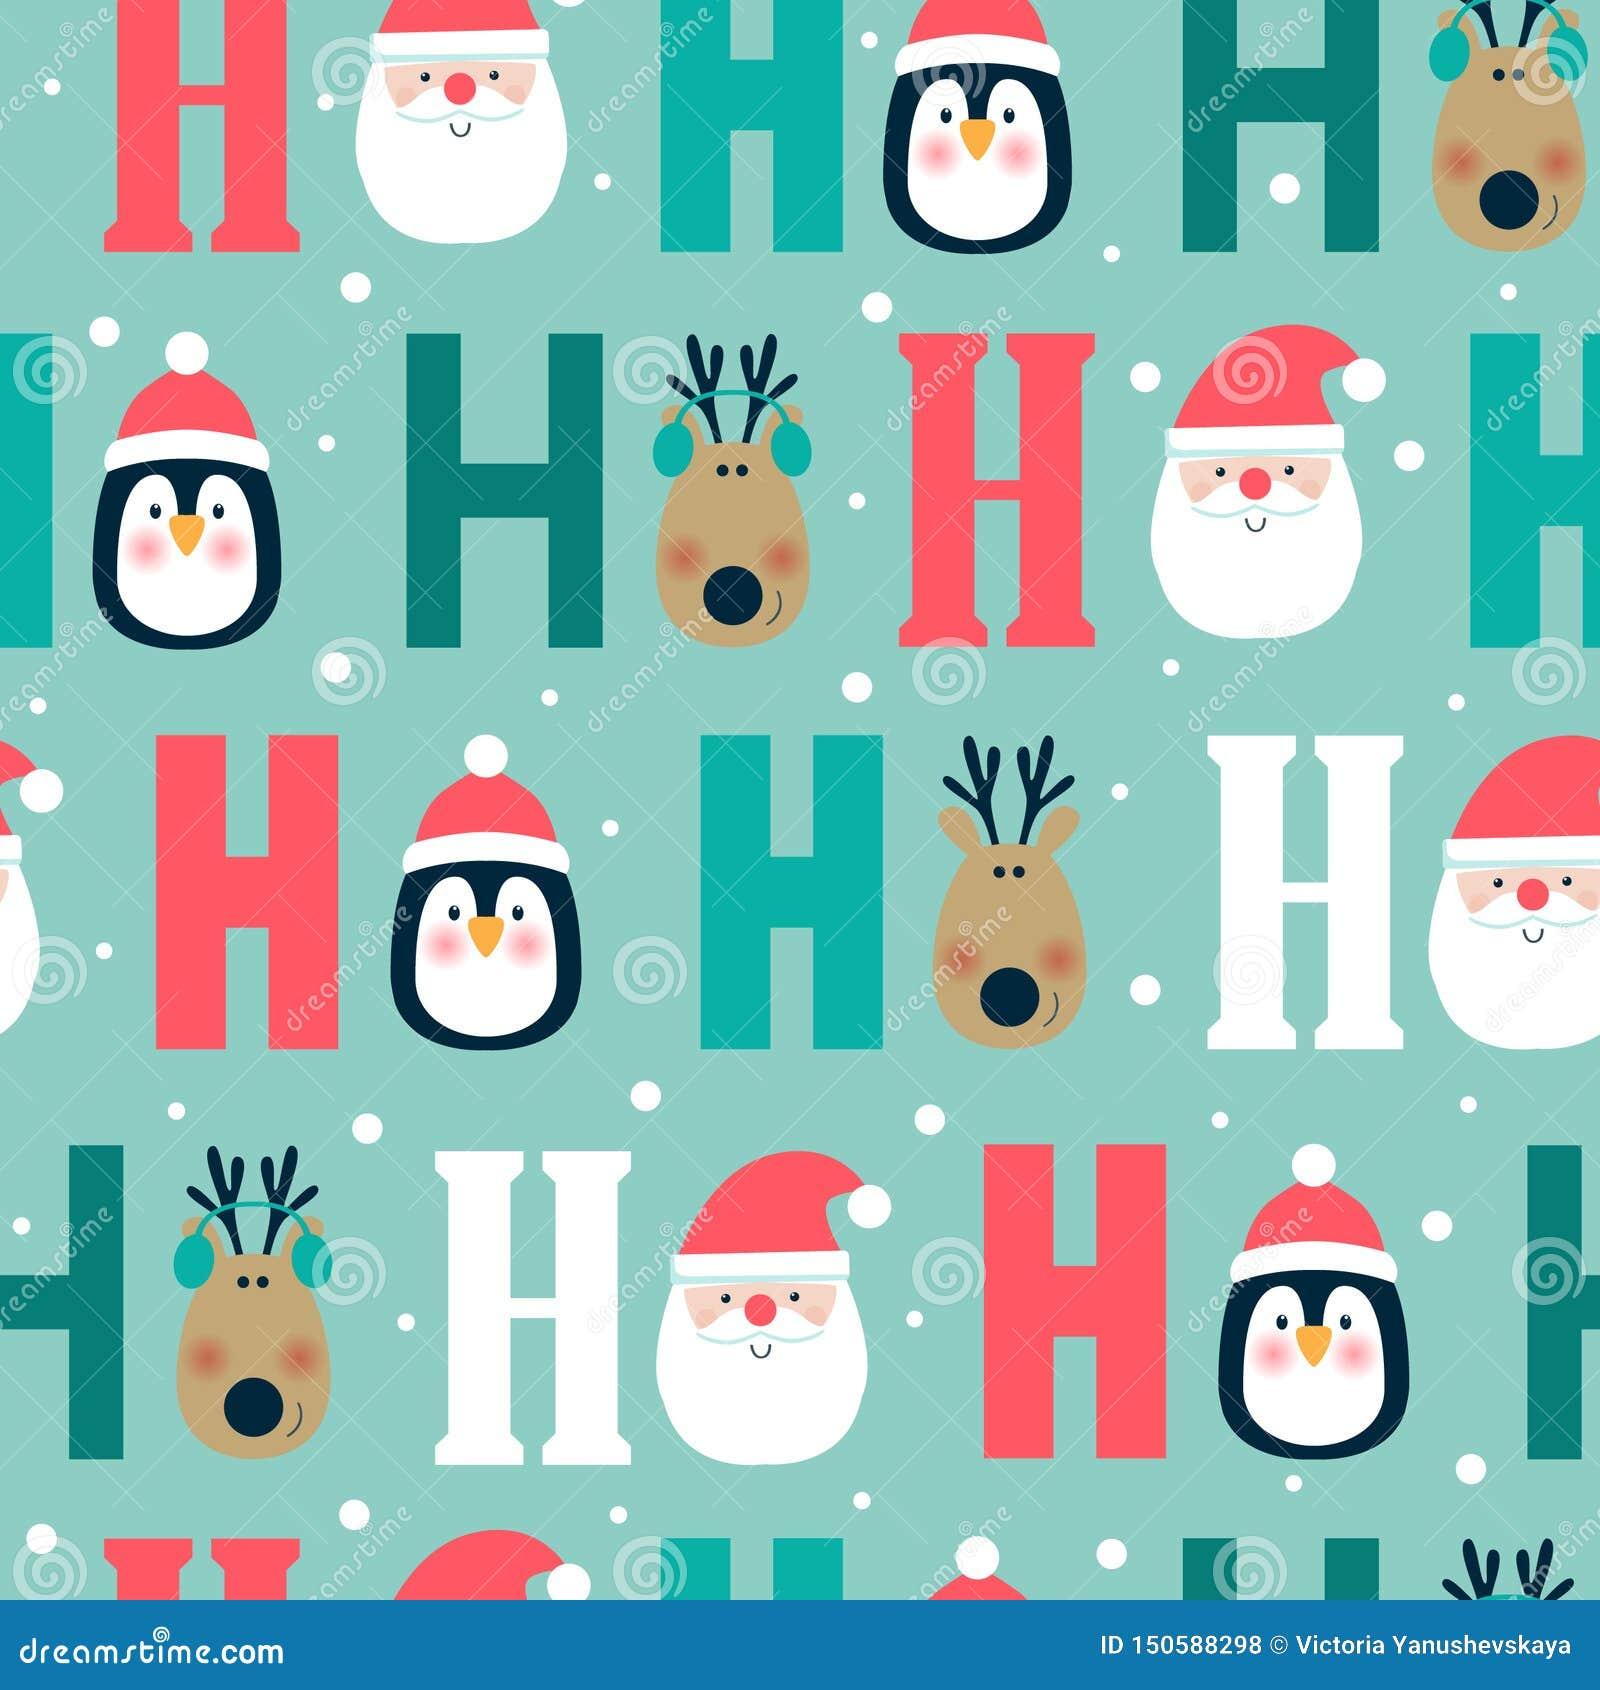 Nahtloses Weihnachtsmuster mit Rotwild, Pinguin und Sankt Kopf ho ho ho,